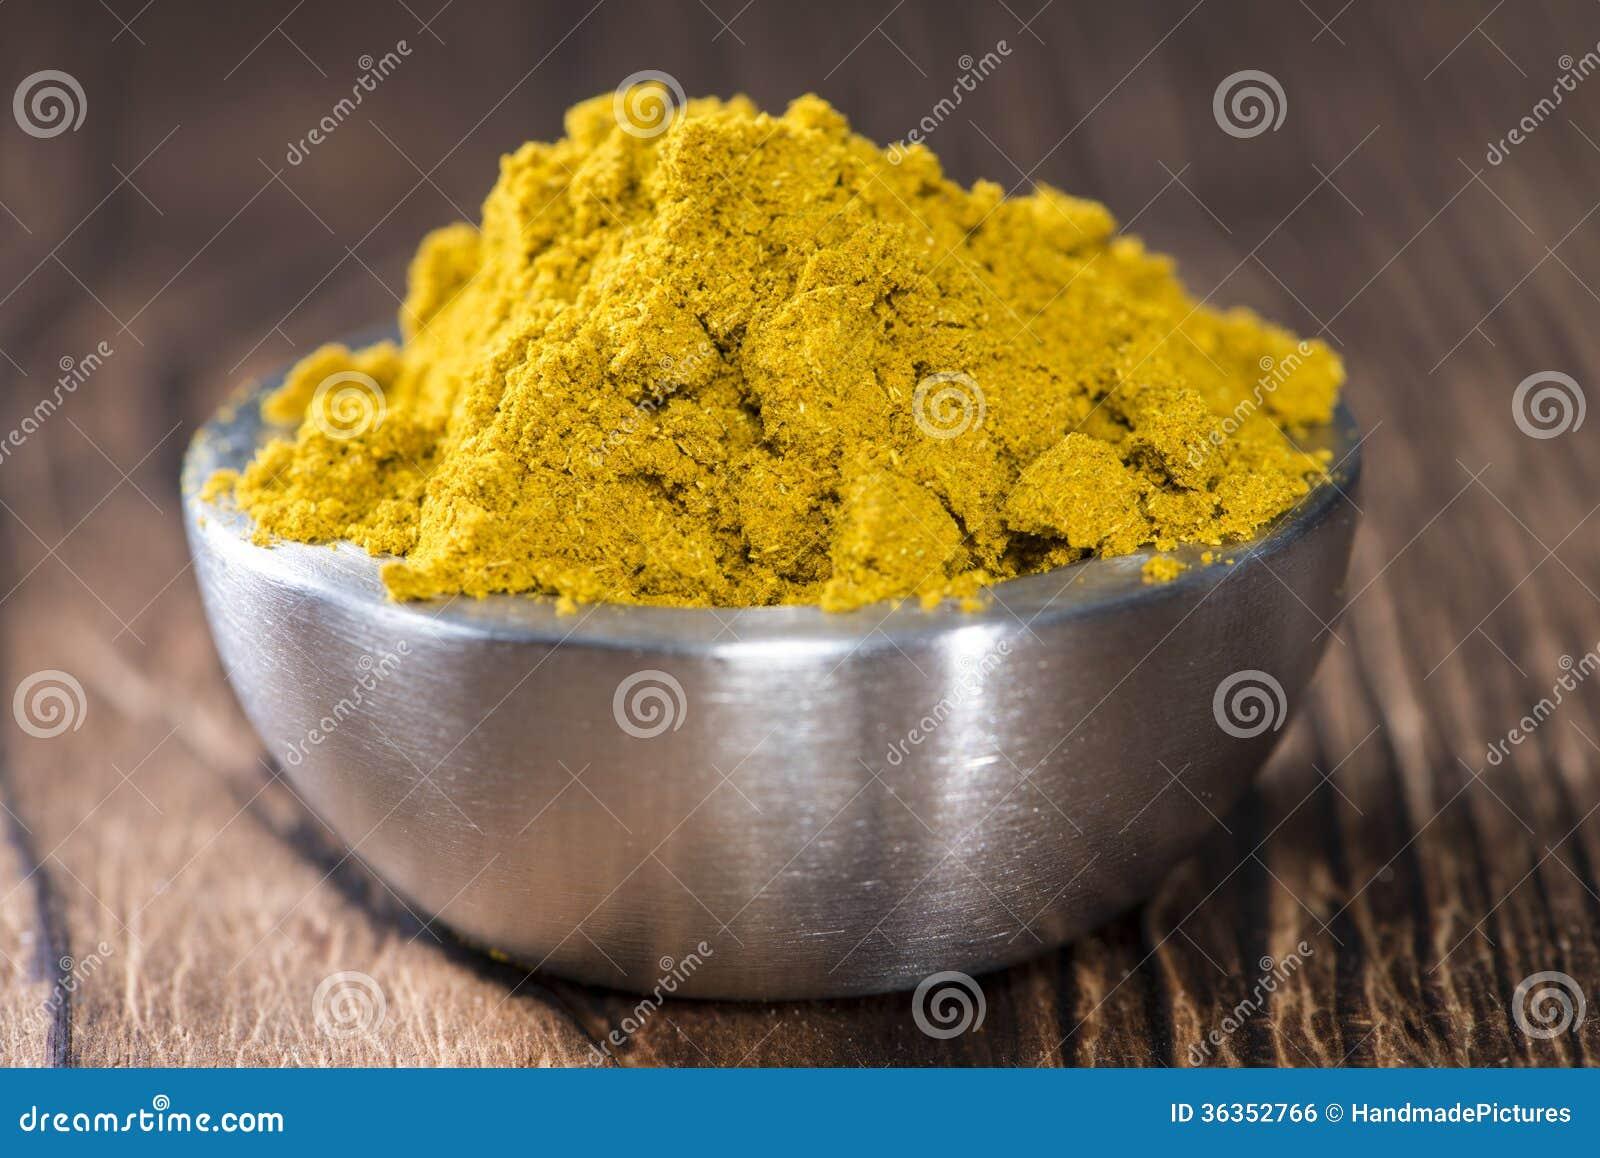 Bunke med curry